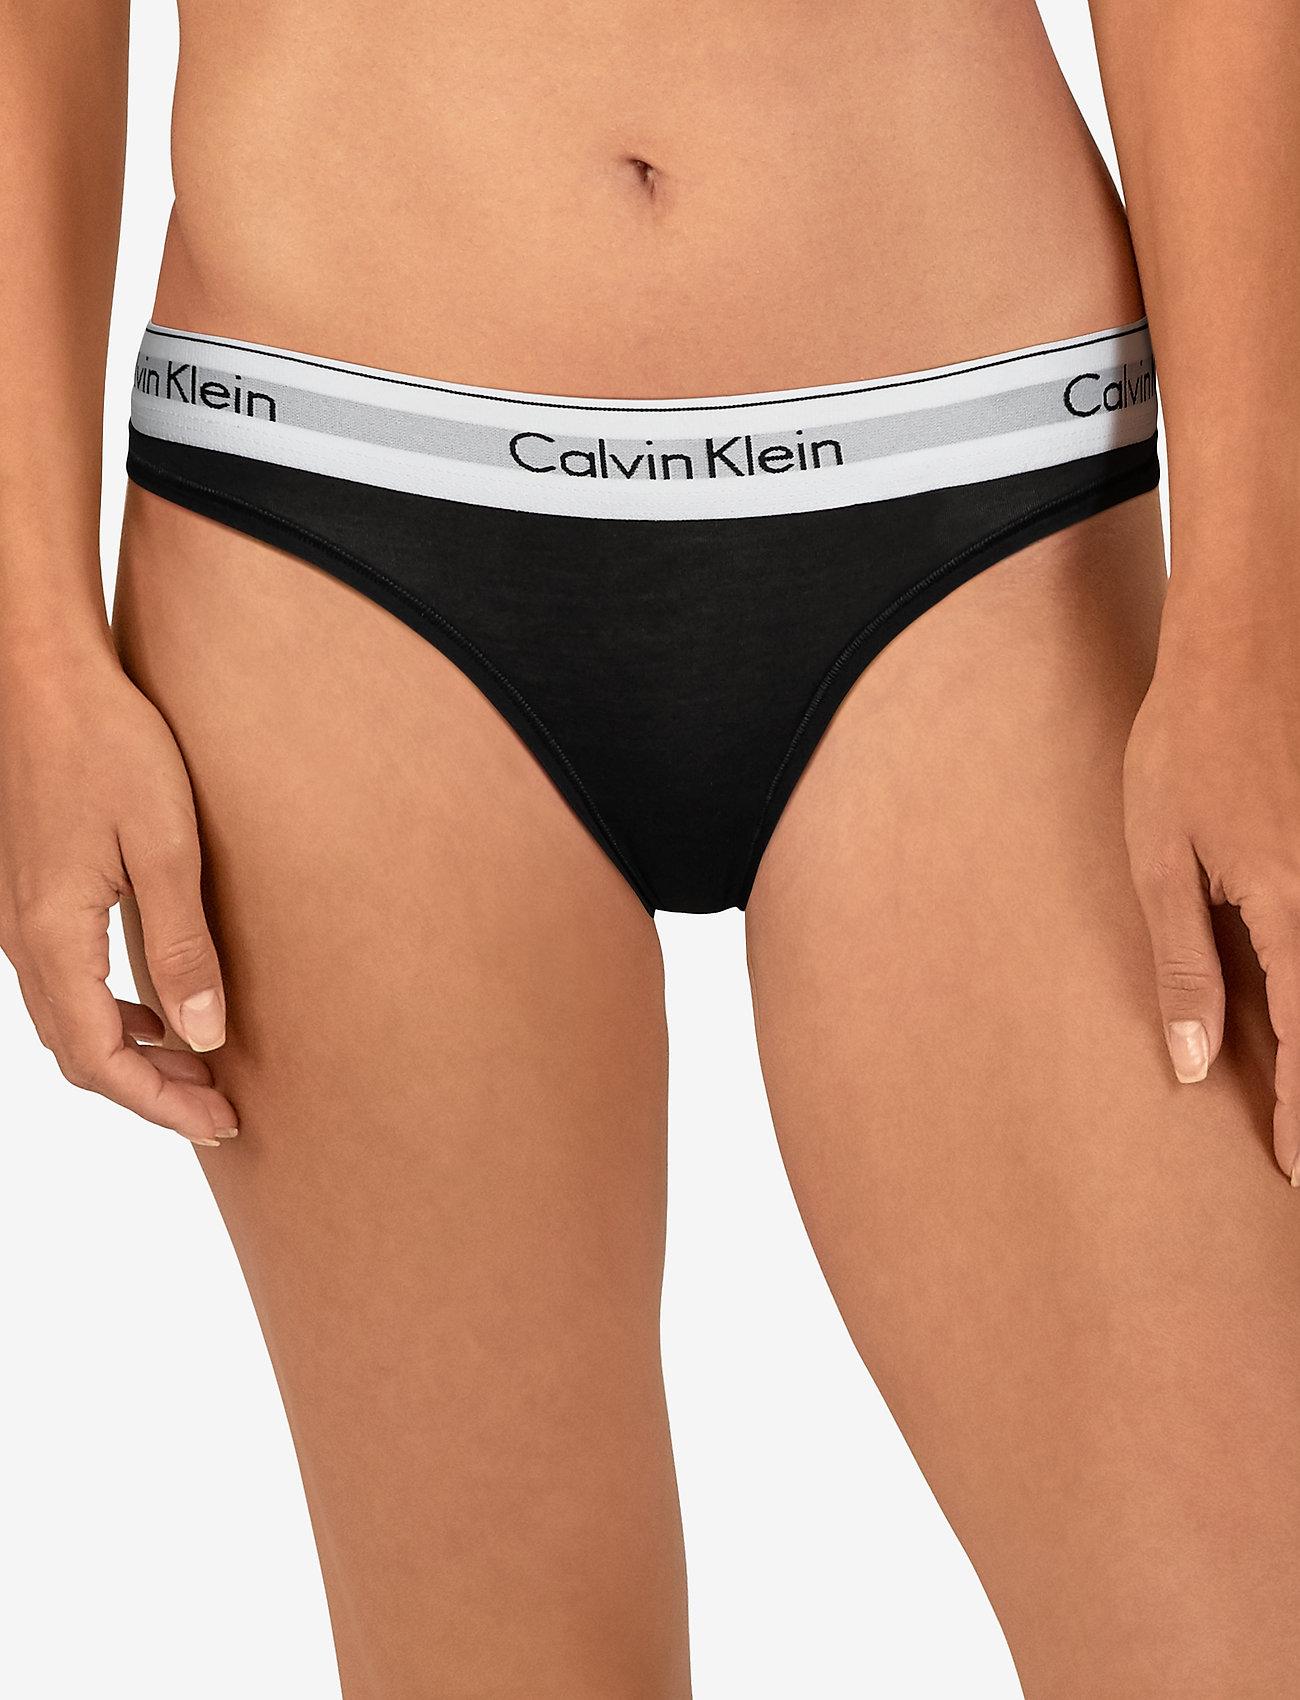 Calvin Klein THONG - BLACK